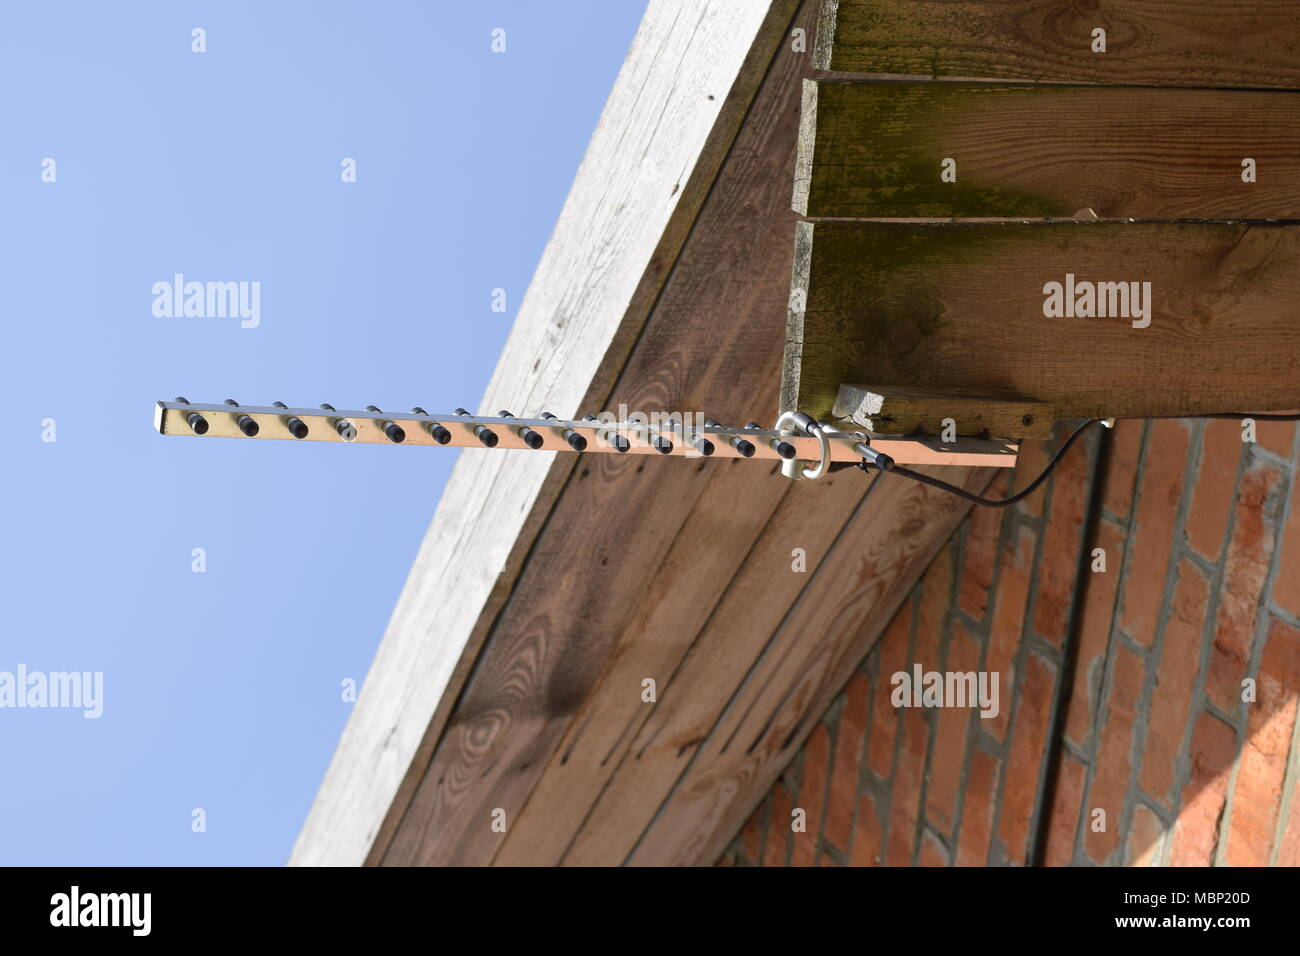 The antenna Yagi 3g - Stock Image